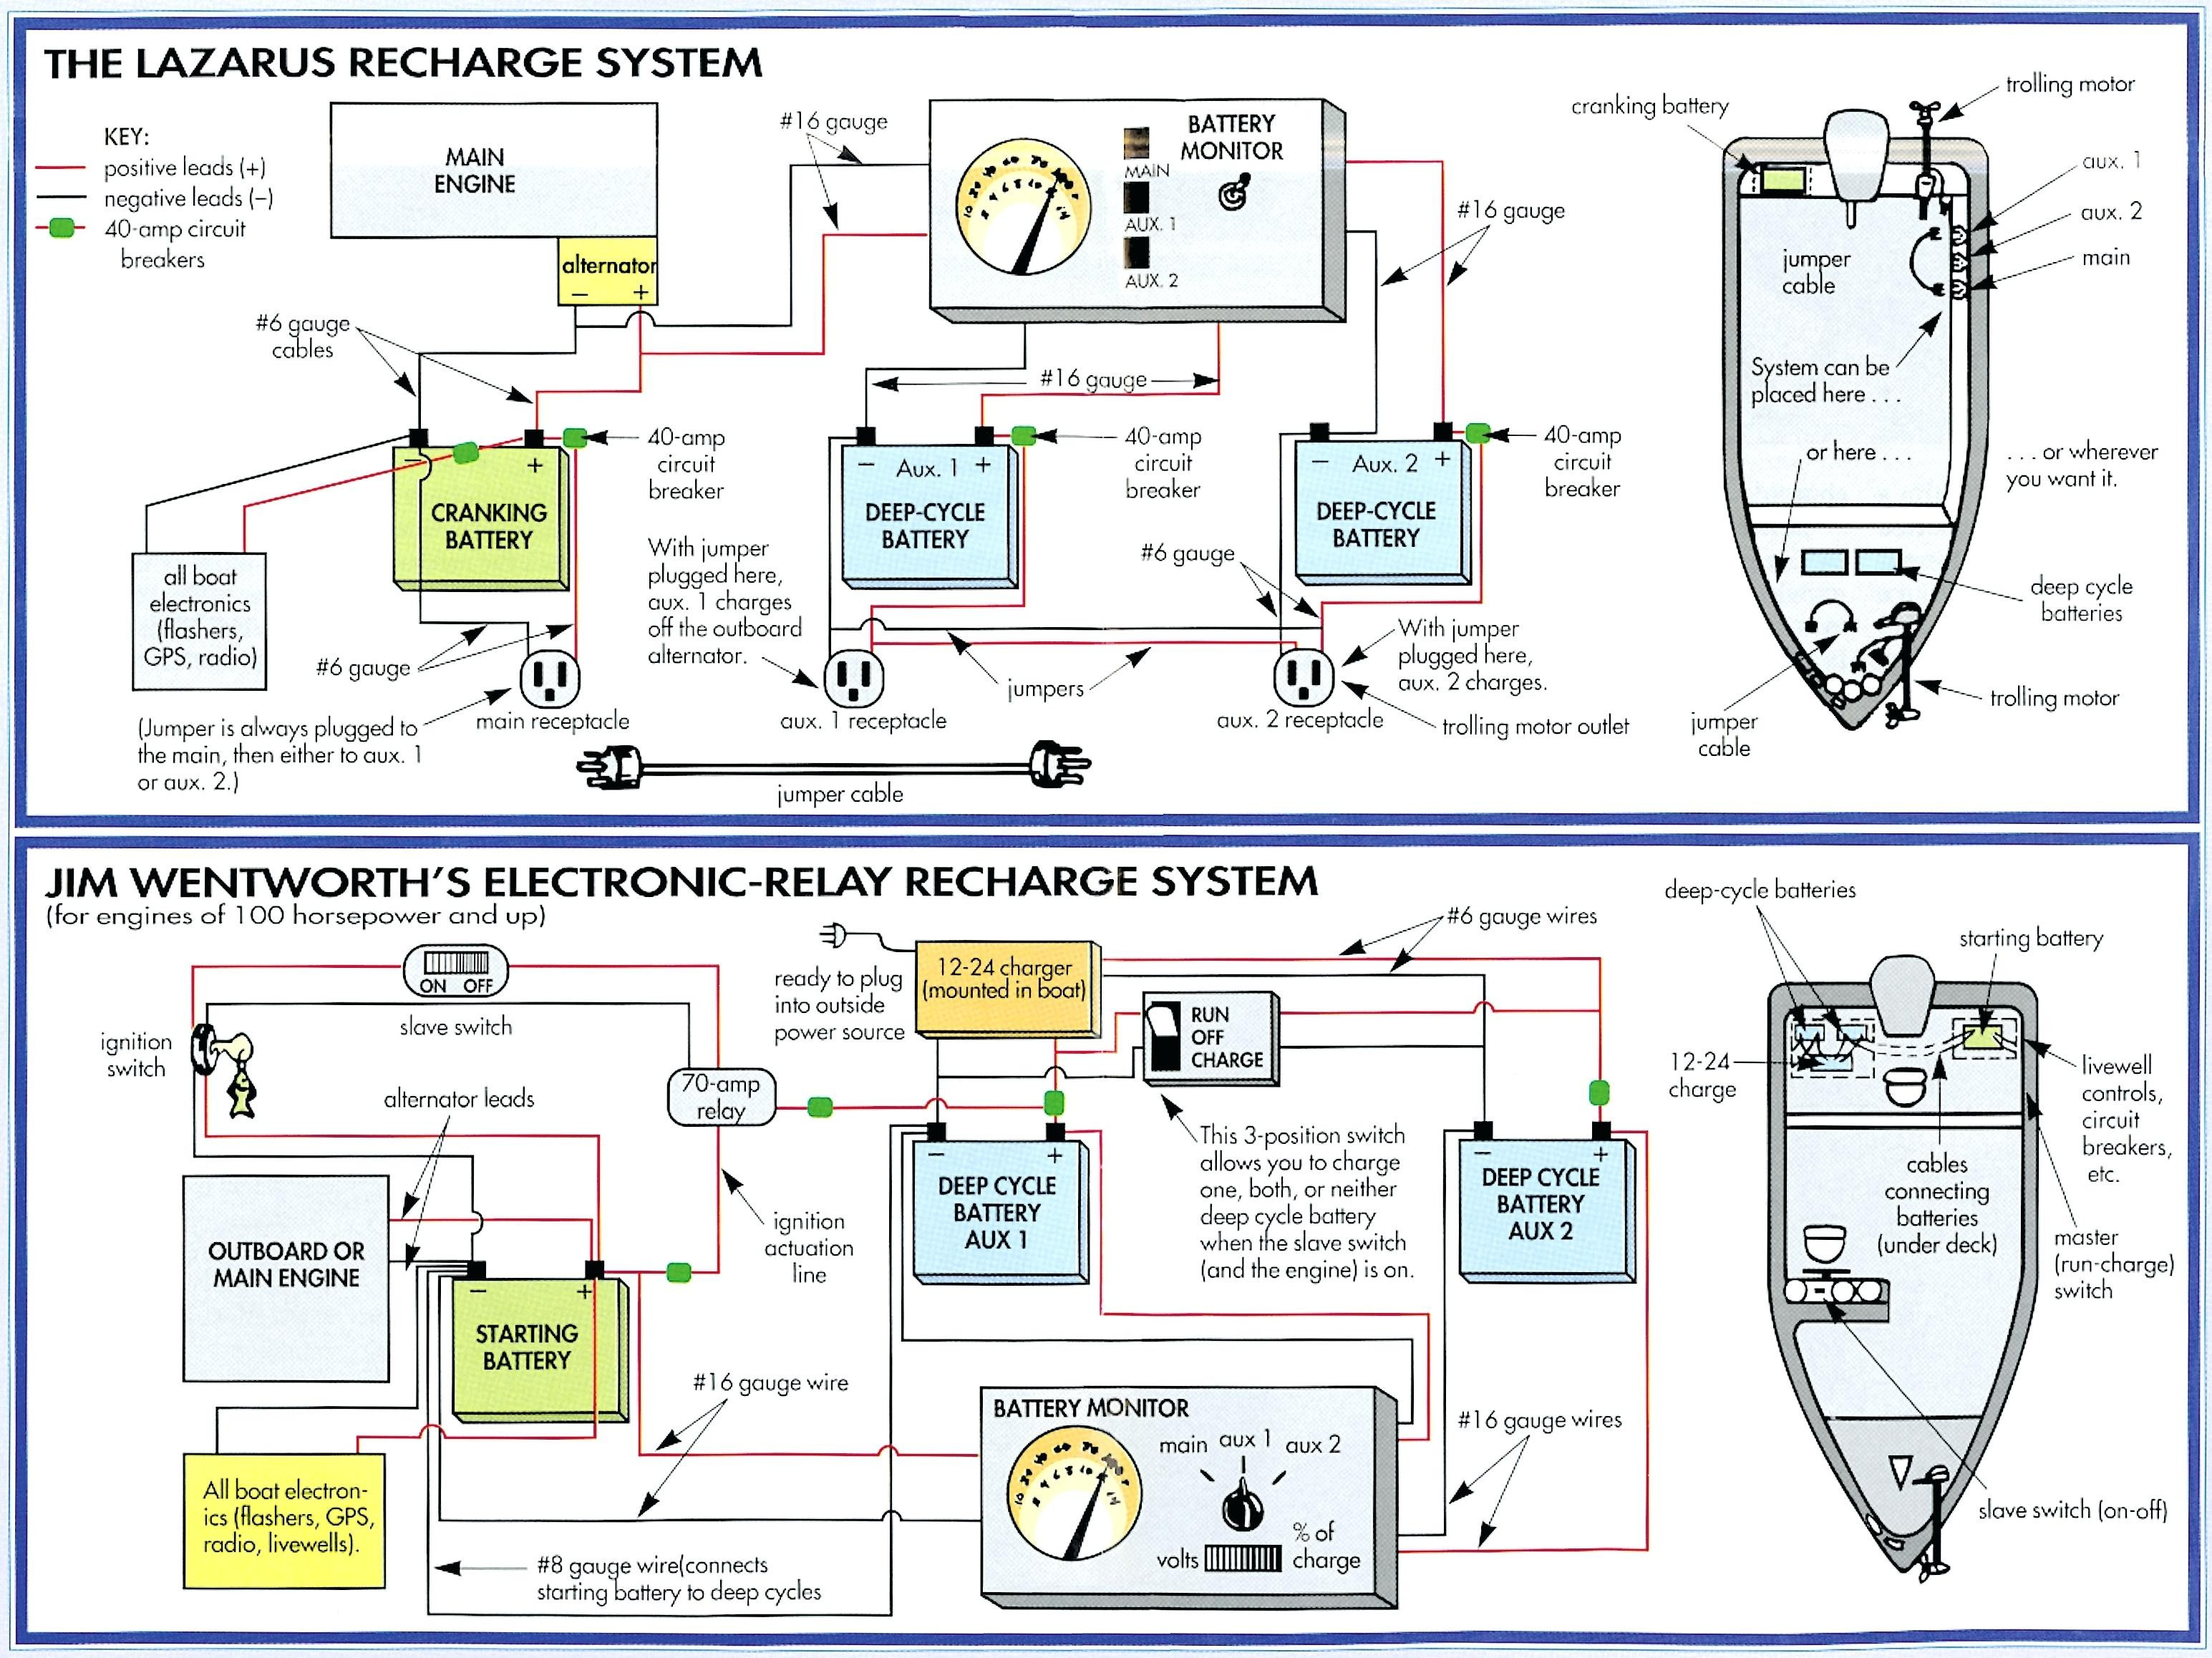 yamaha jet boat dual battery wiring diagram hw 4419  dual battery system wiring diagram for boat schematic wiring  dual battery system wiring diagram for